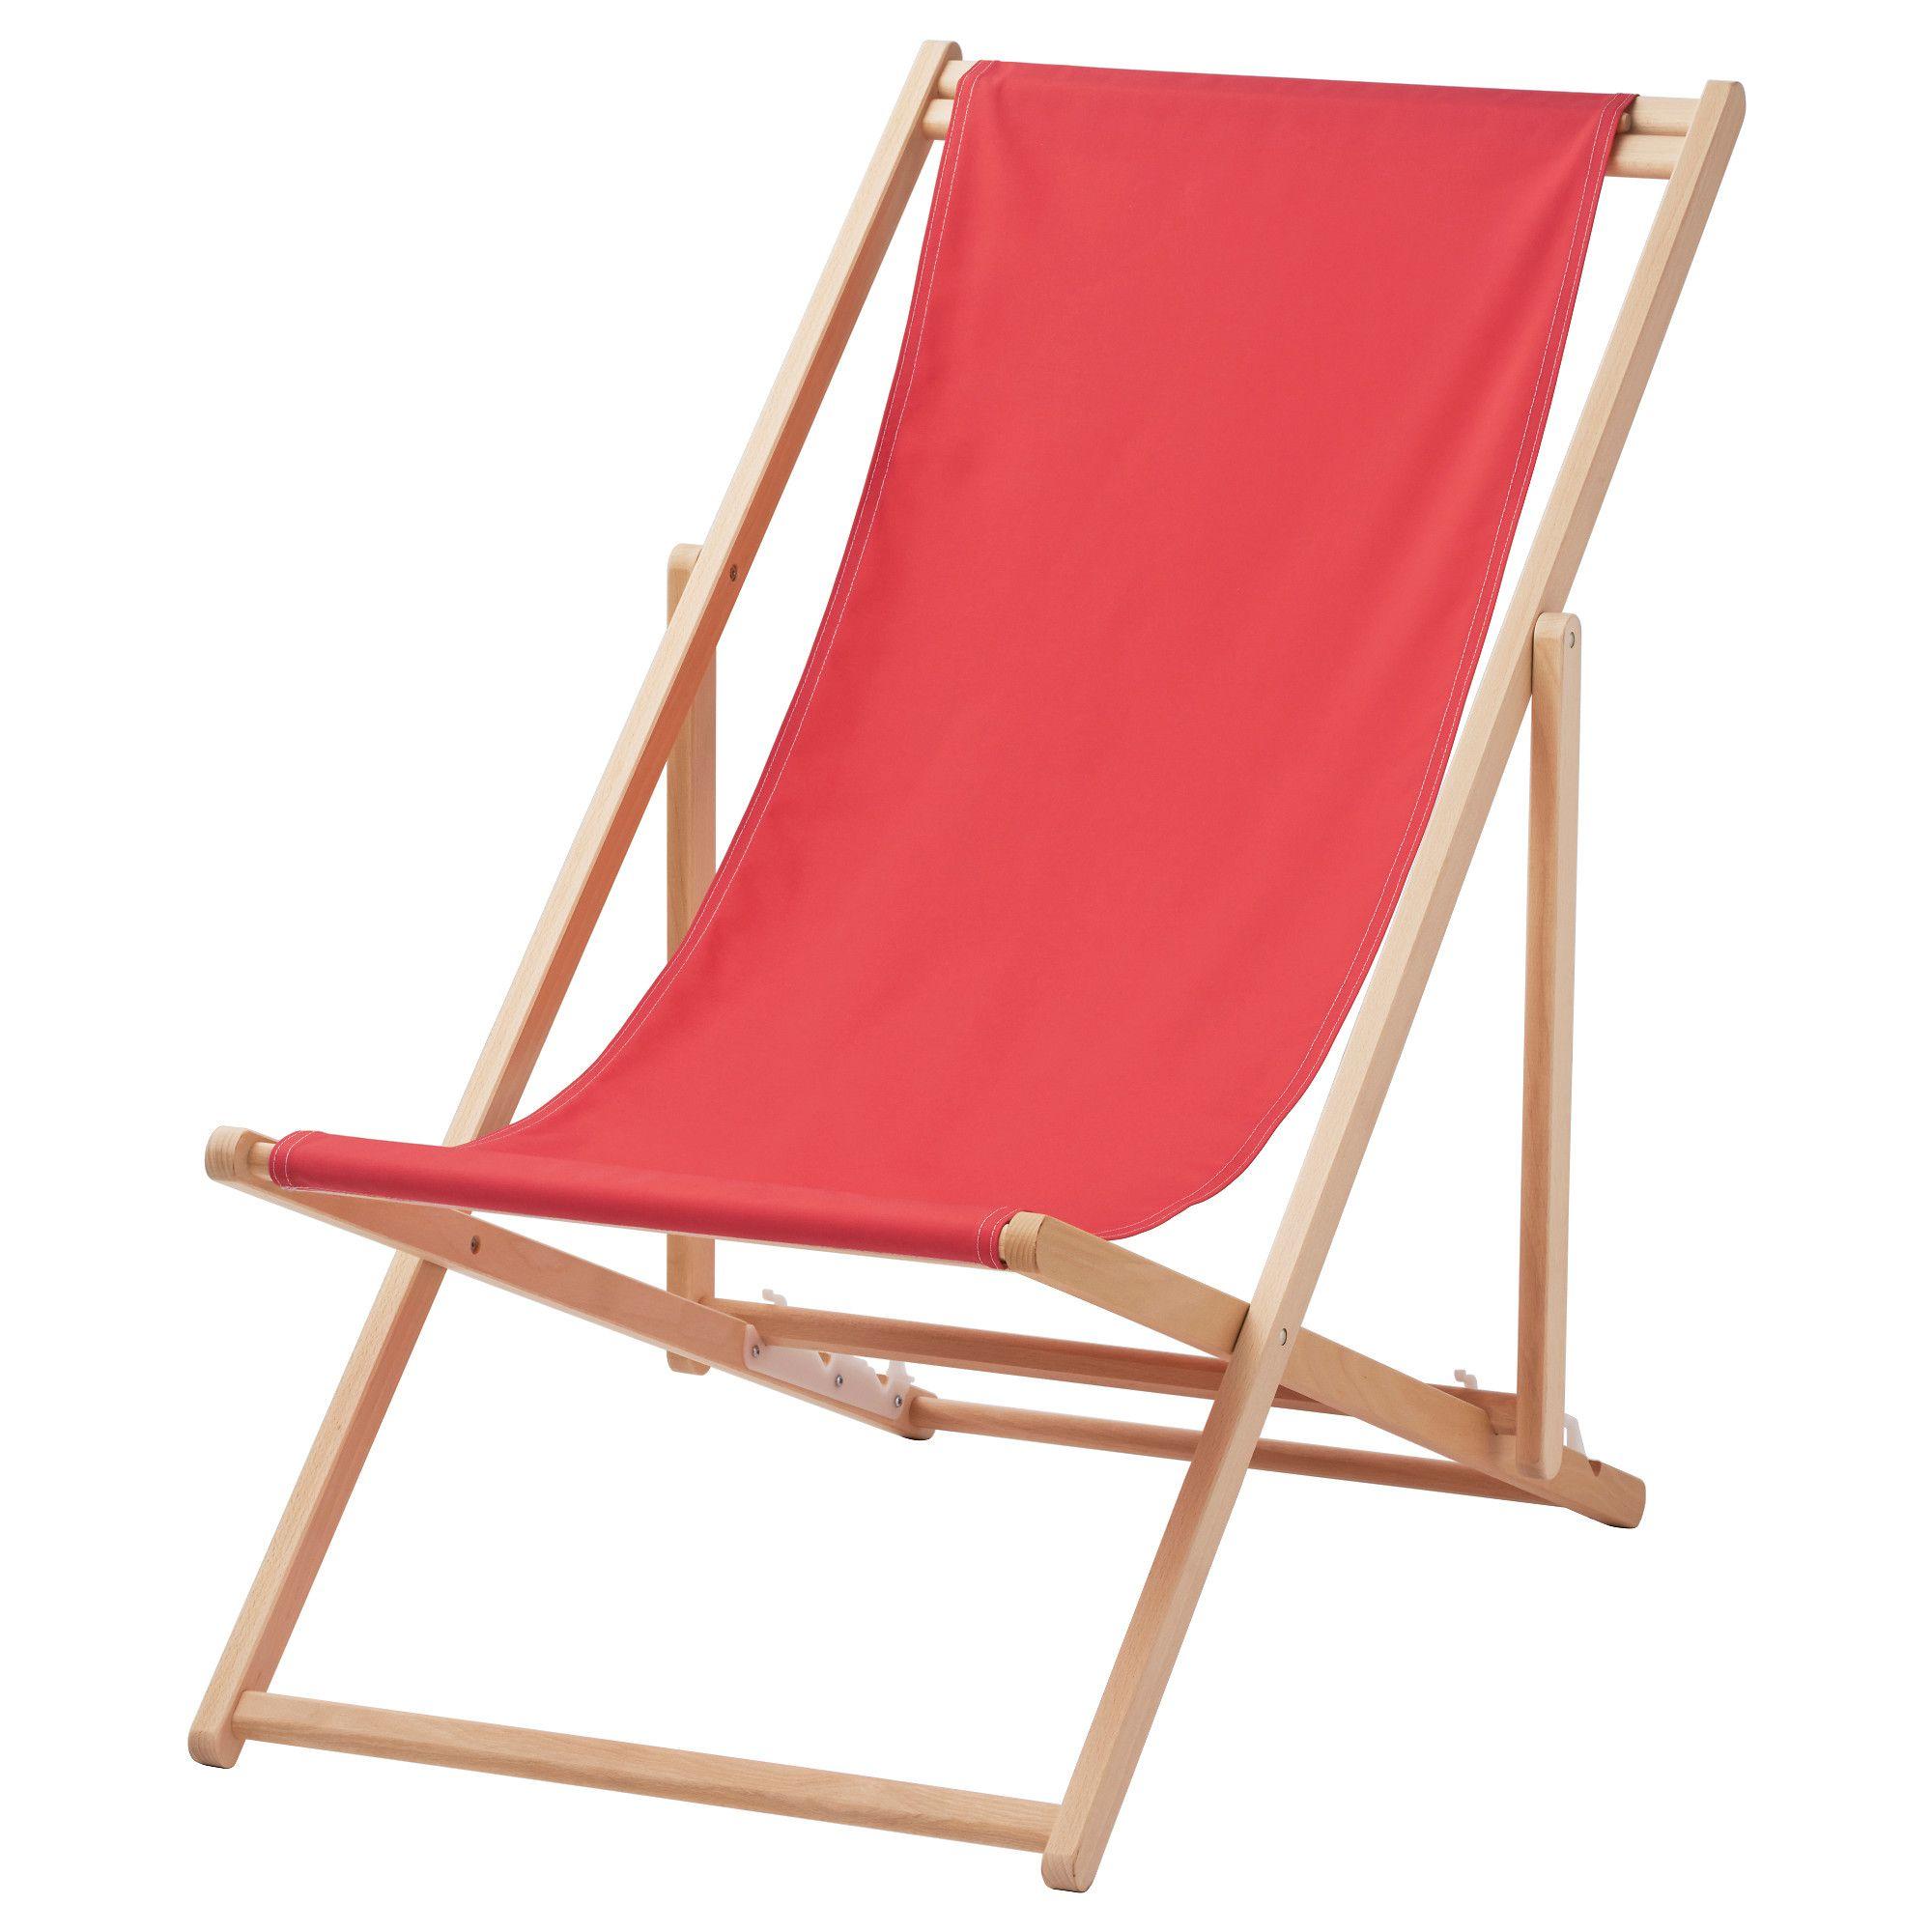 Us - Furniture And Home Furnishings   Rattan Effect Garden ... pour Transat Jardin Ikea